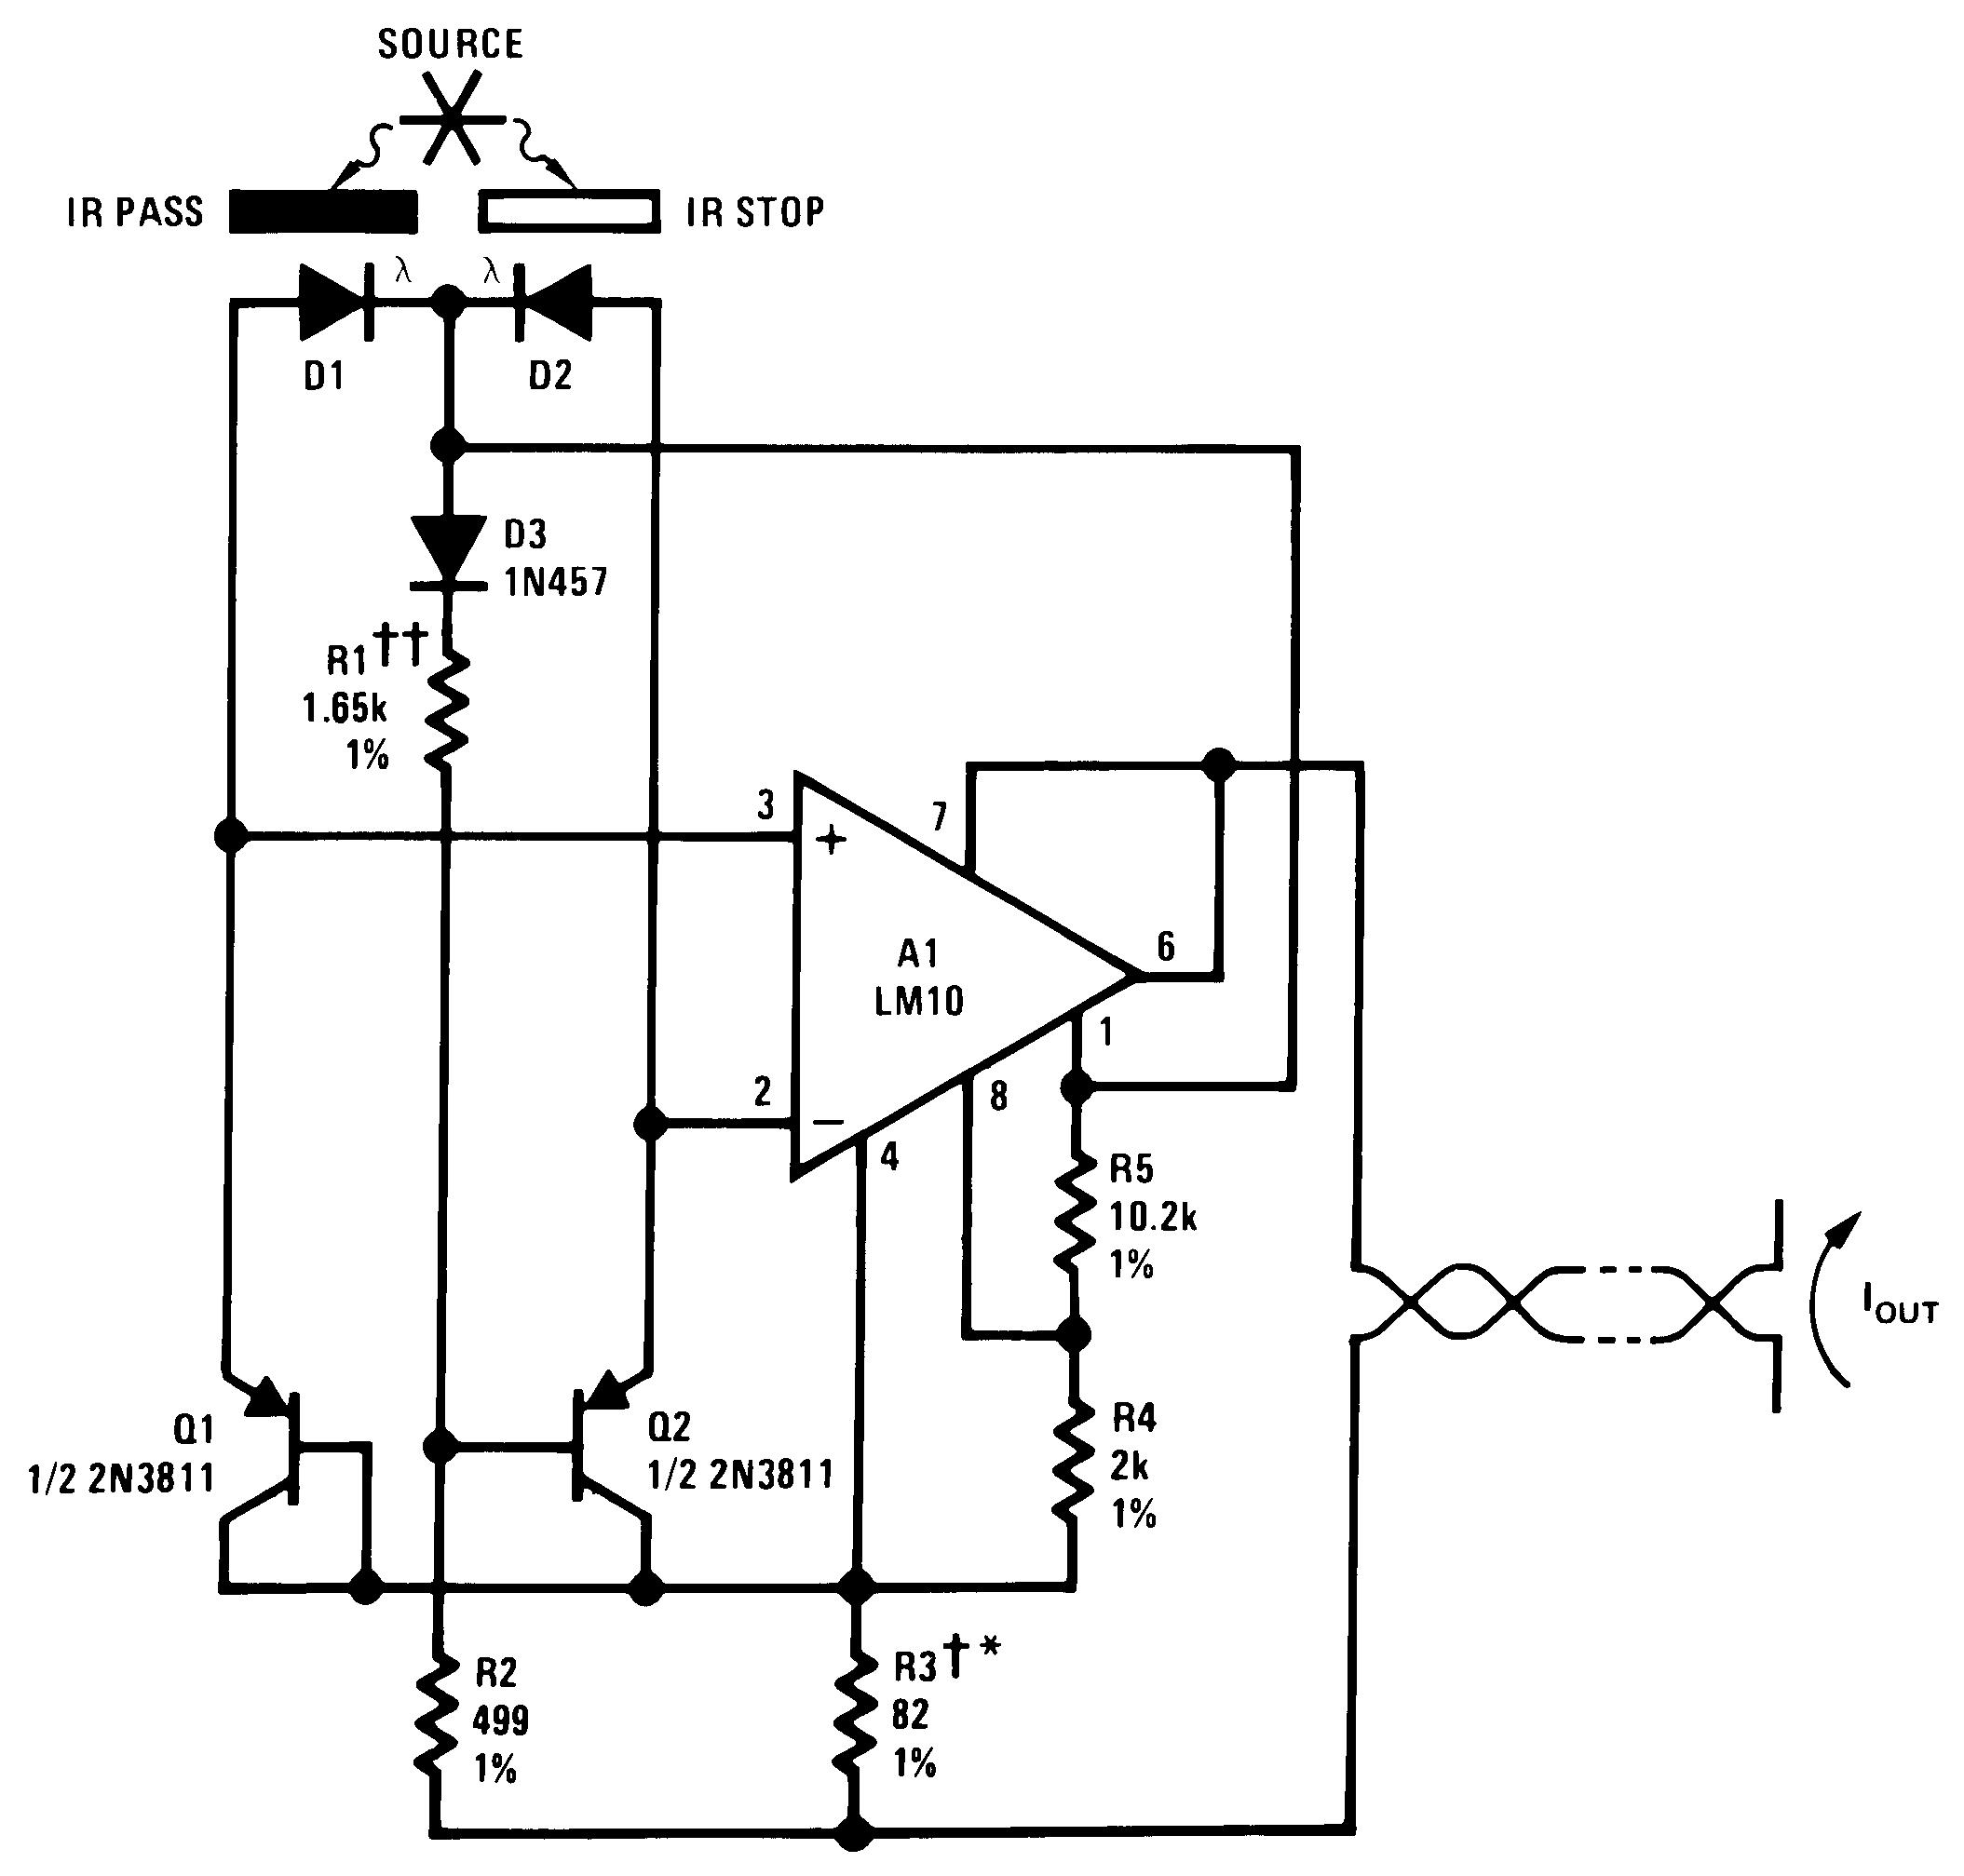 Lm10 Infrared Sensor Wiring Diagram 00565271